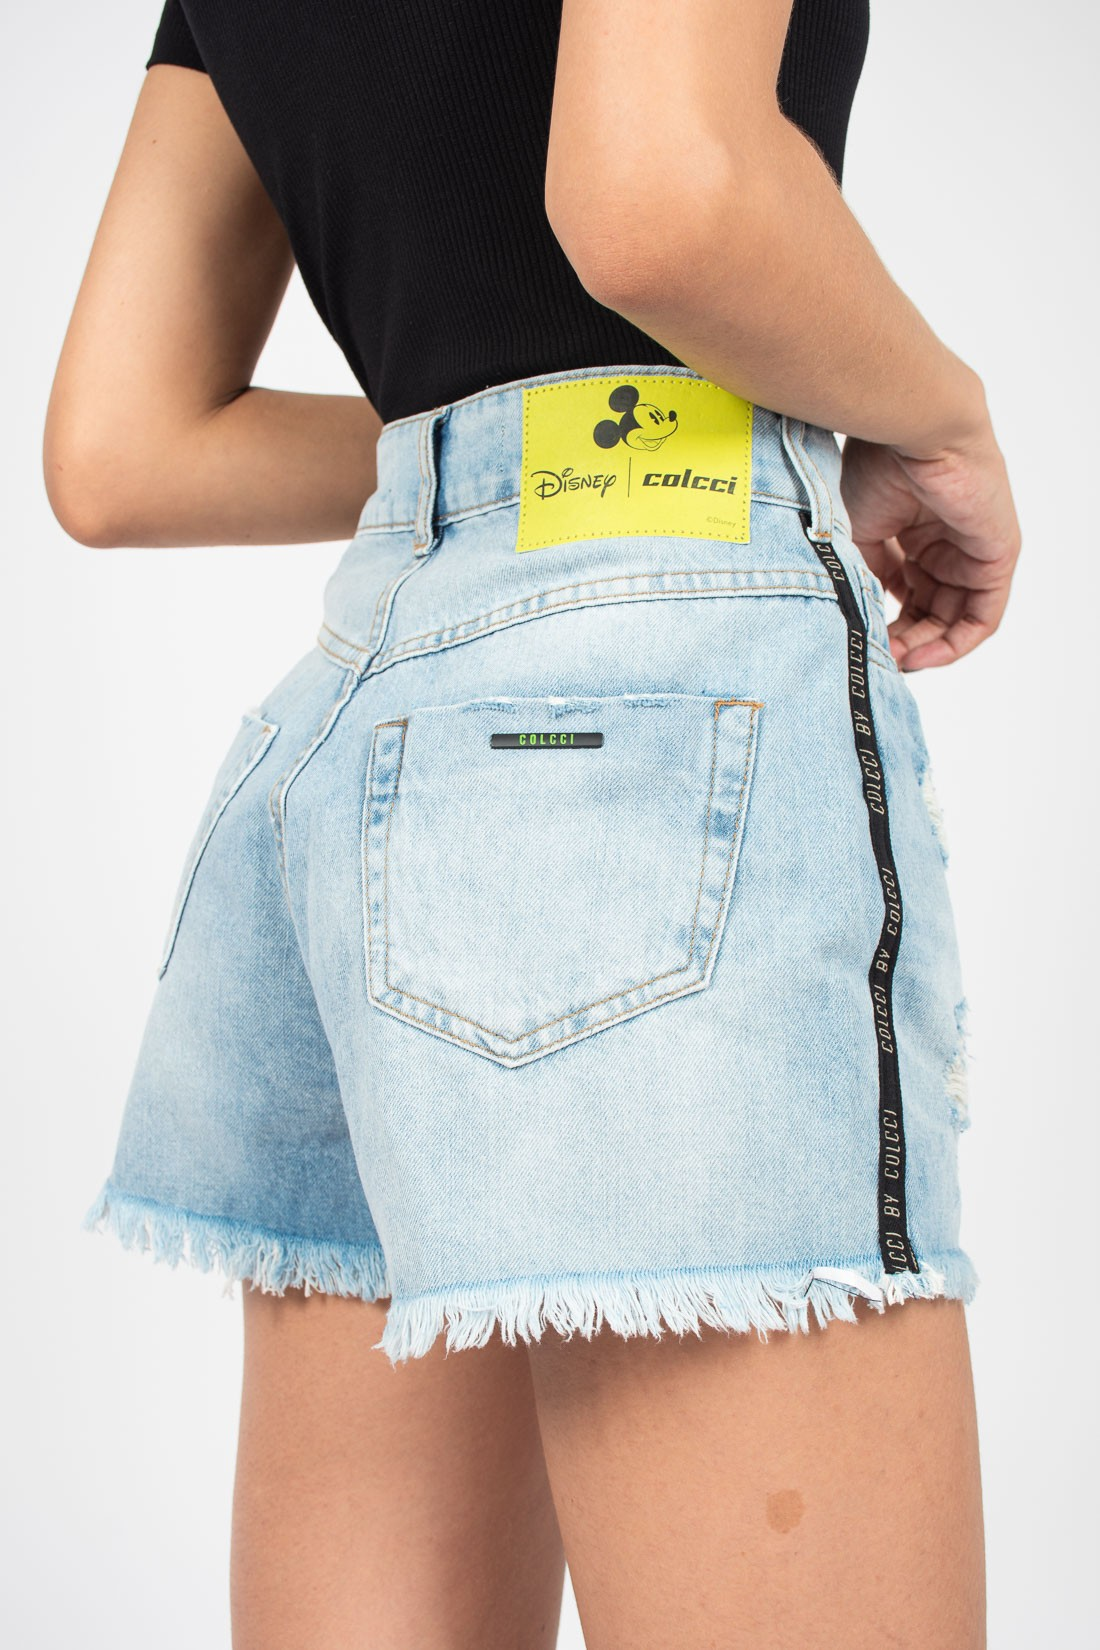 Shorts Jeans Colcci Mickey